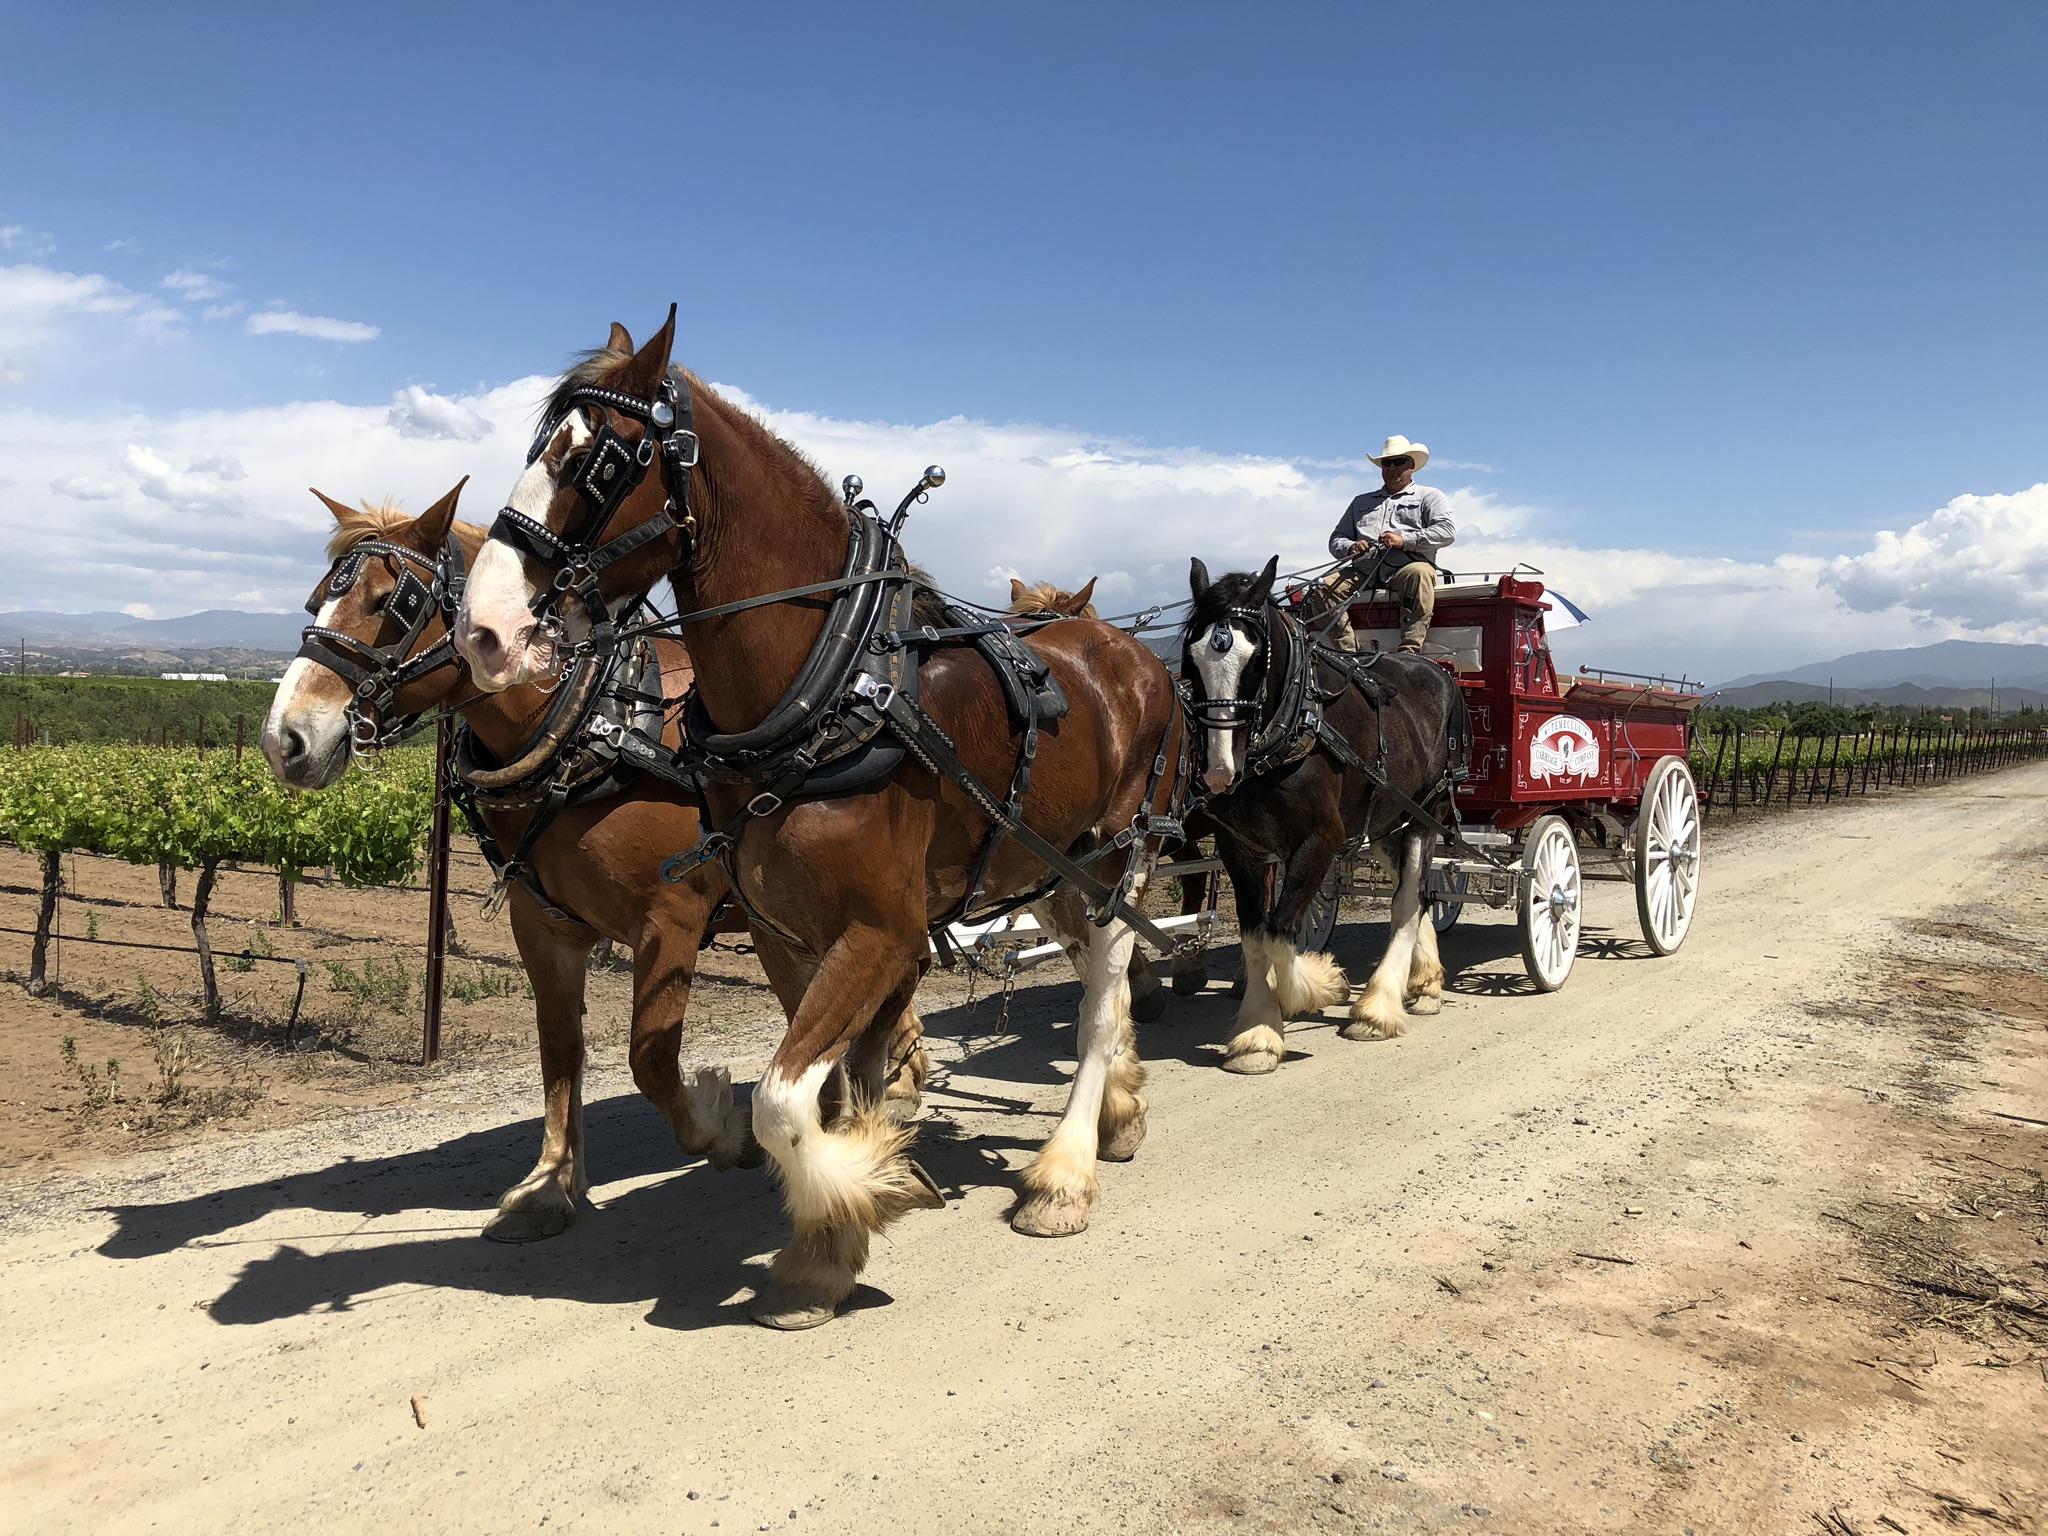 Horse Drawn Carriage Rides Temecula Ca Temecula Carriage Company